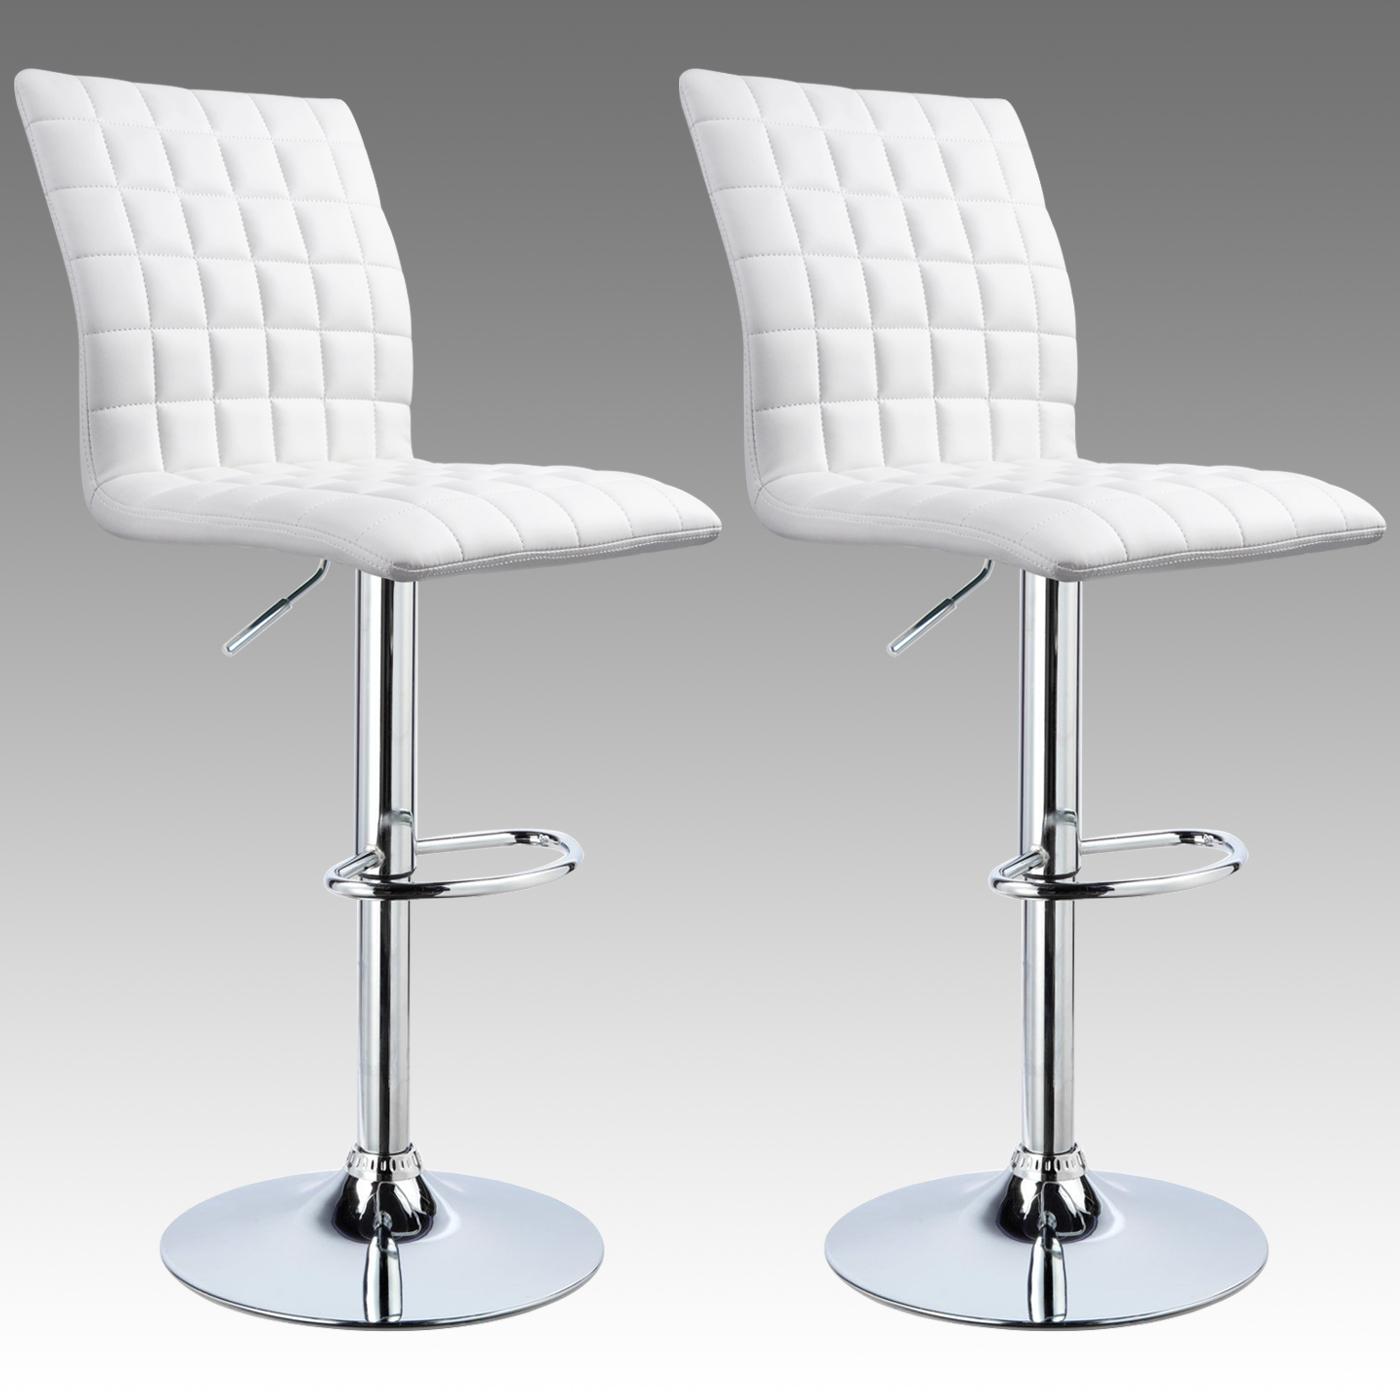 2er set barhocker tresenhocker k chenhocker kunstleder barstuhl schwarz 450 ebay. Black Bedroom Furniture Sets. Home Design Ideas